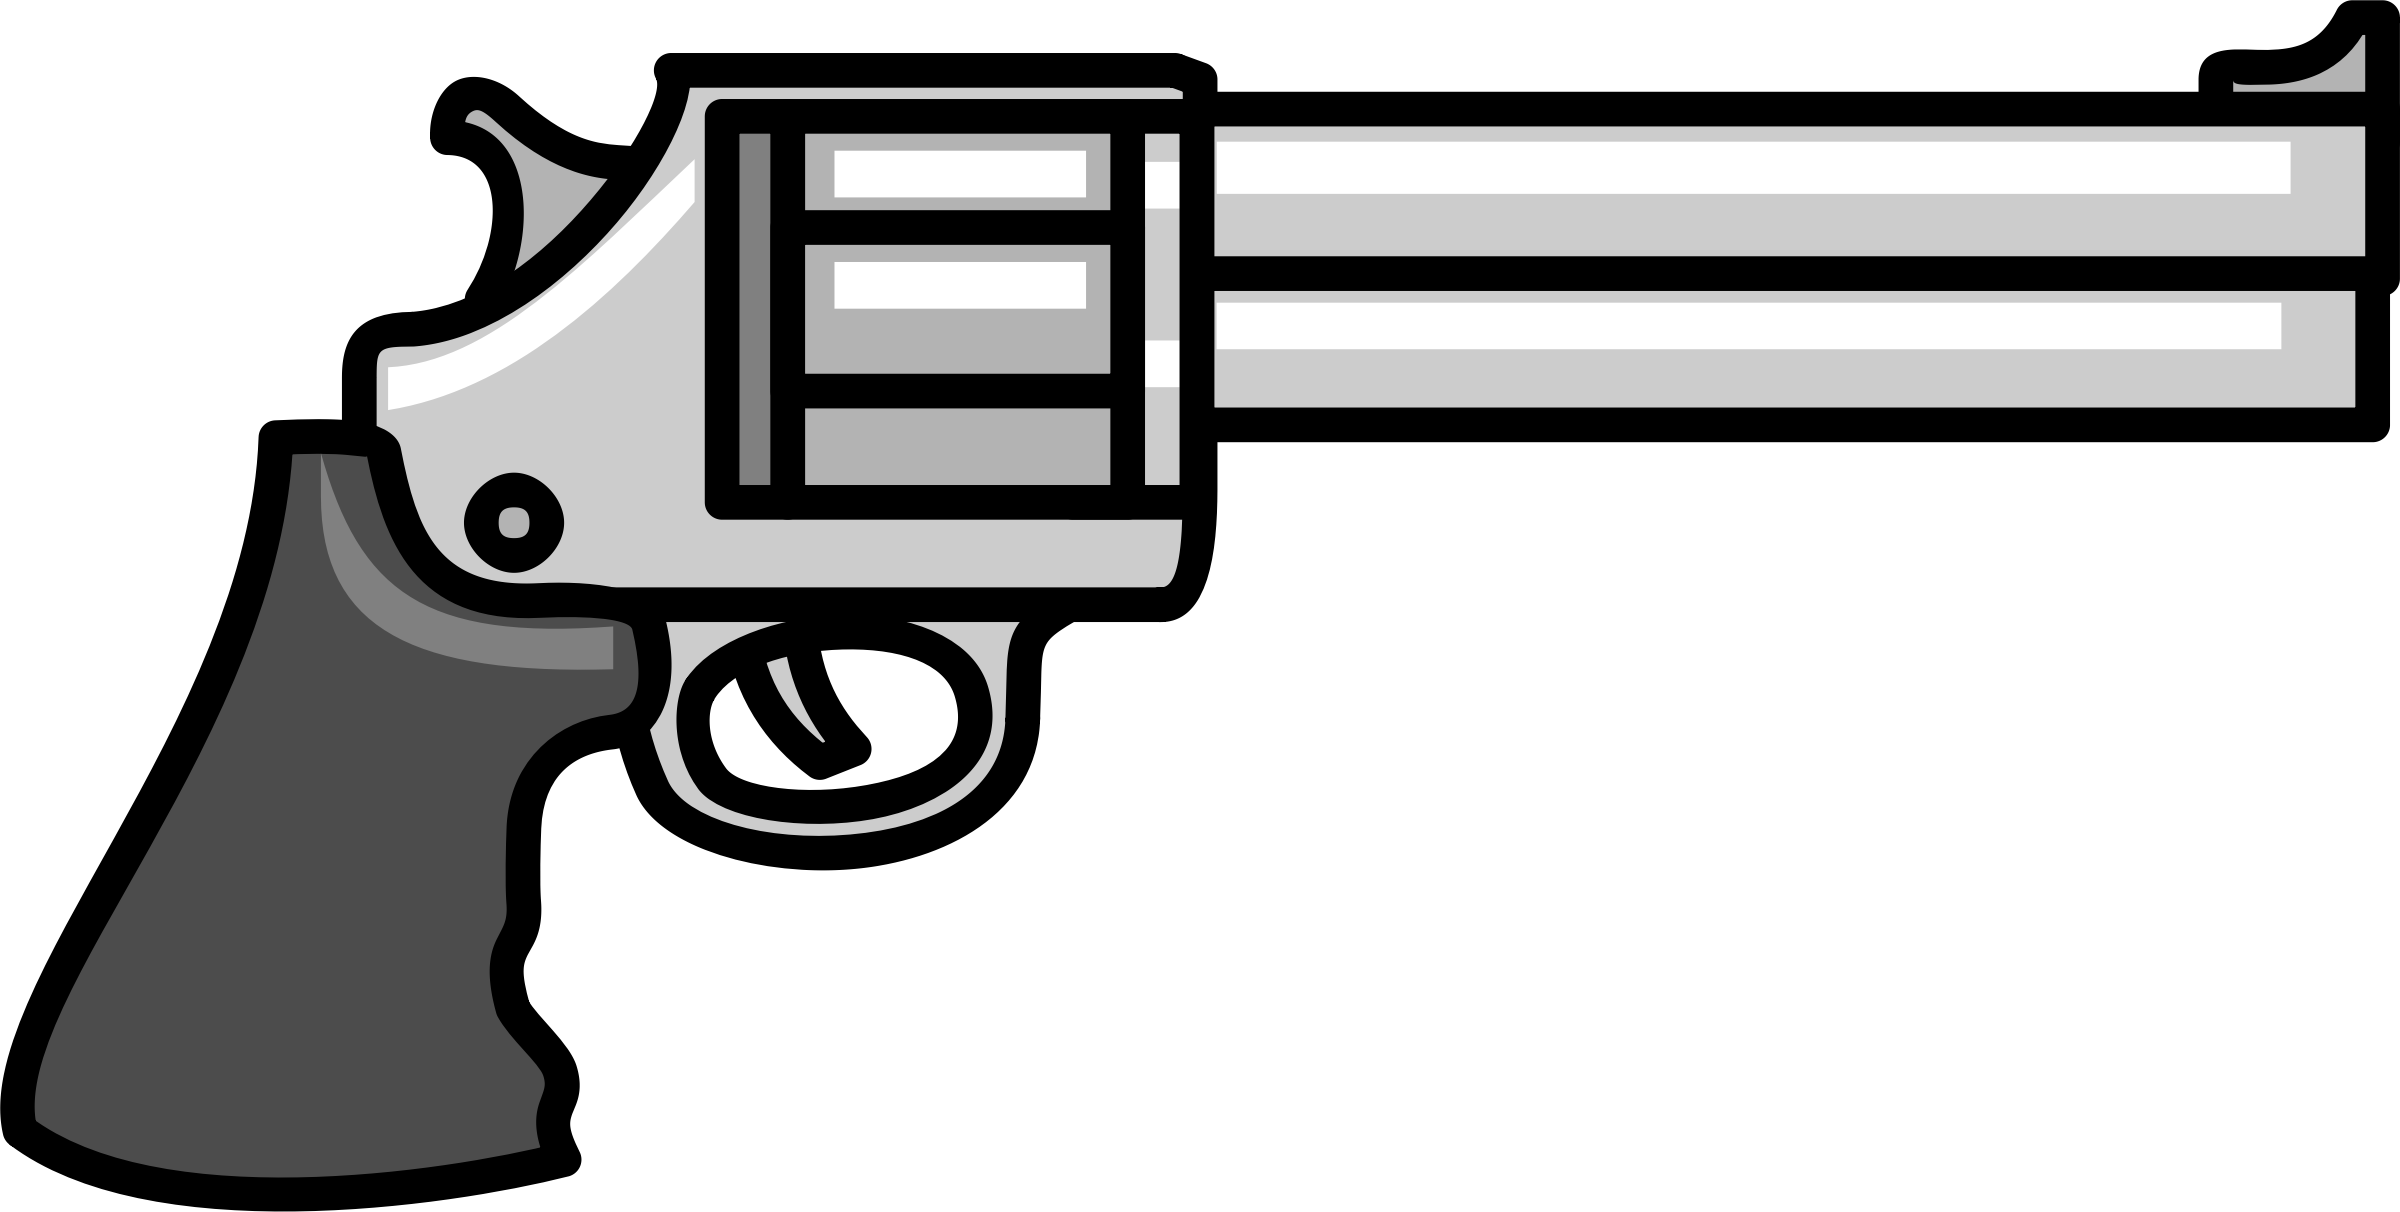 Pistol clipart clip art, Pistol clip art Transparent FREE.